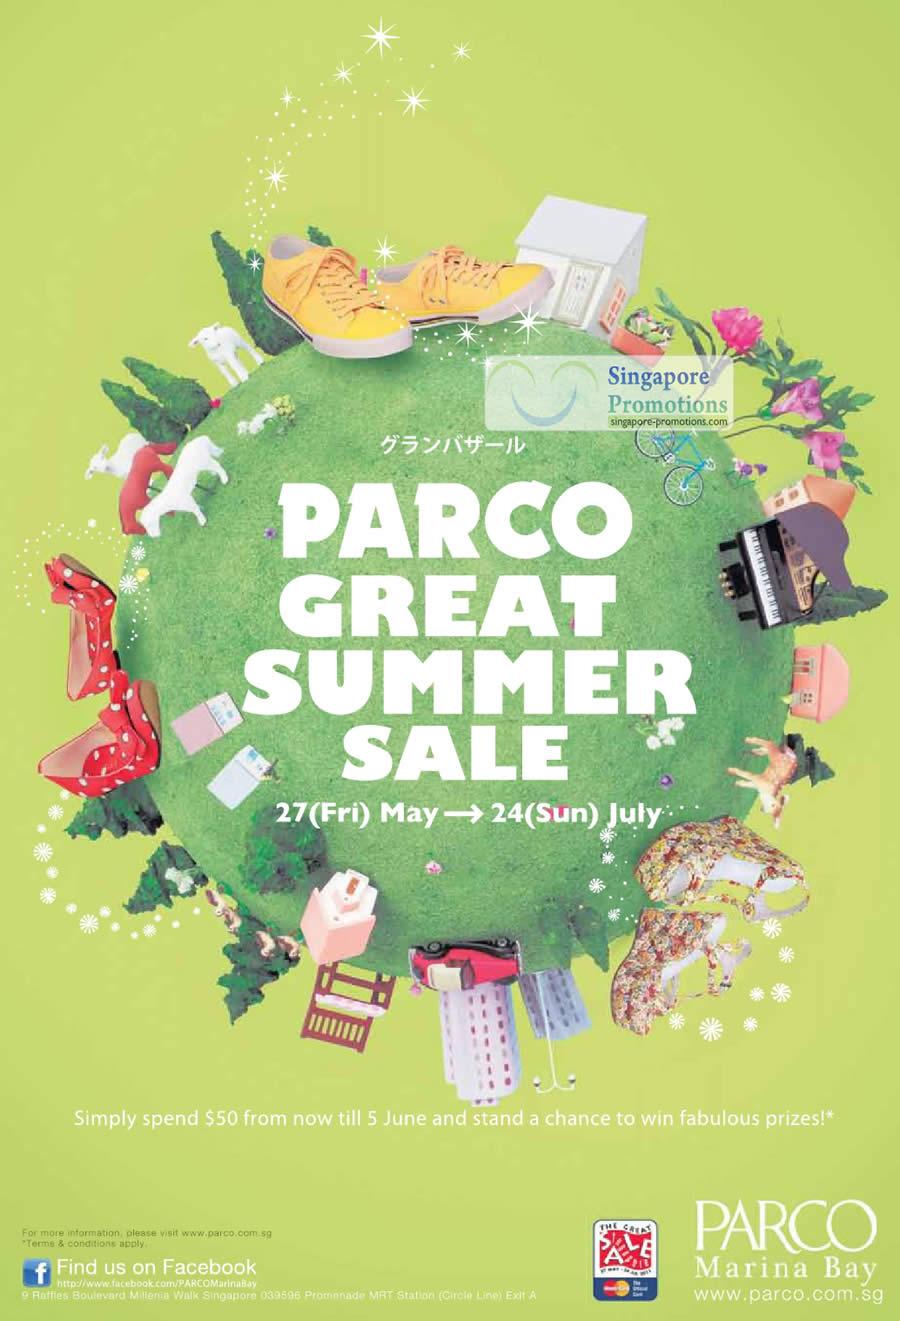 Parco 27 May 2011